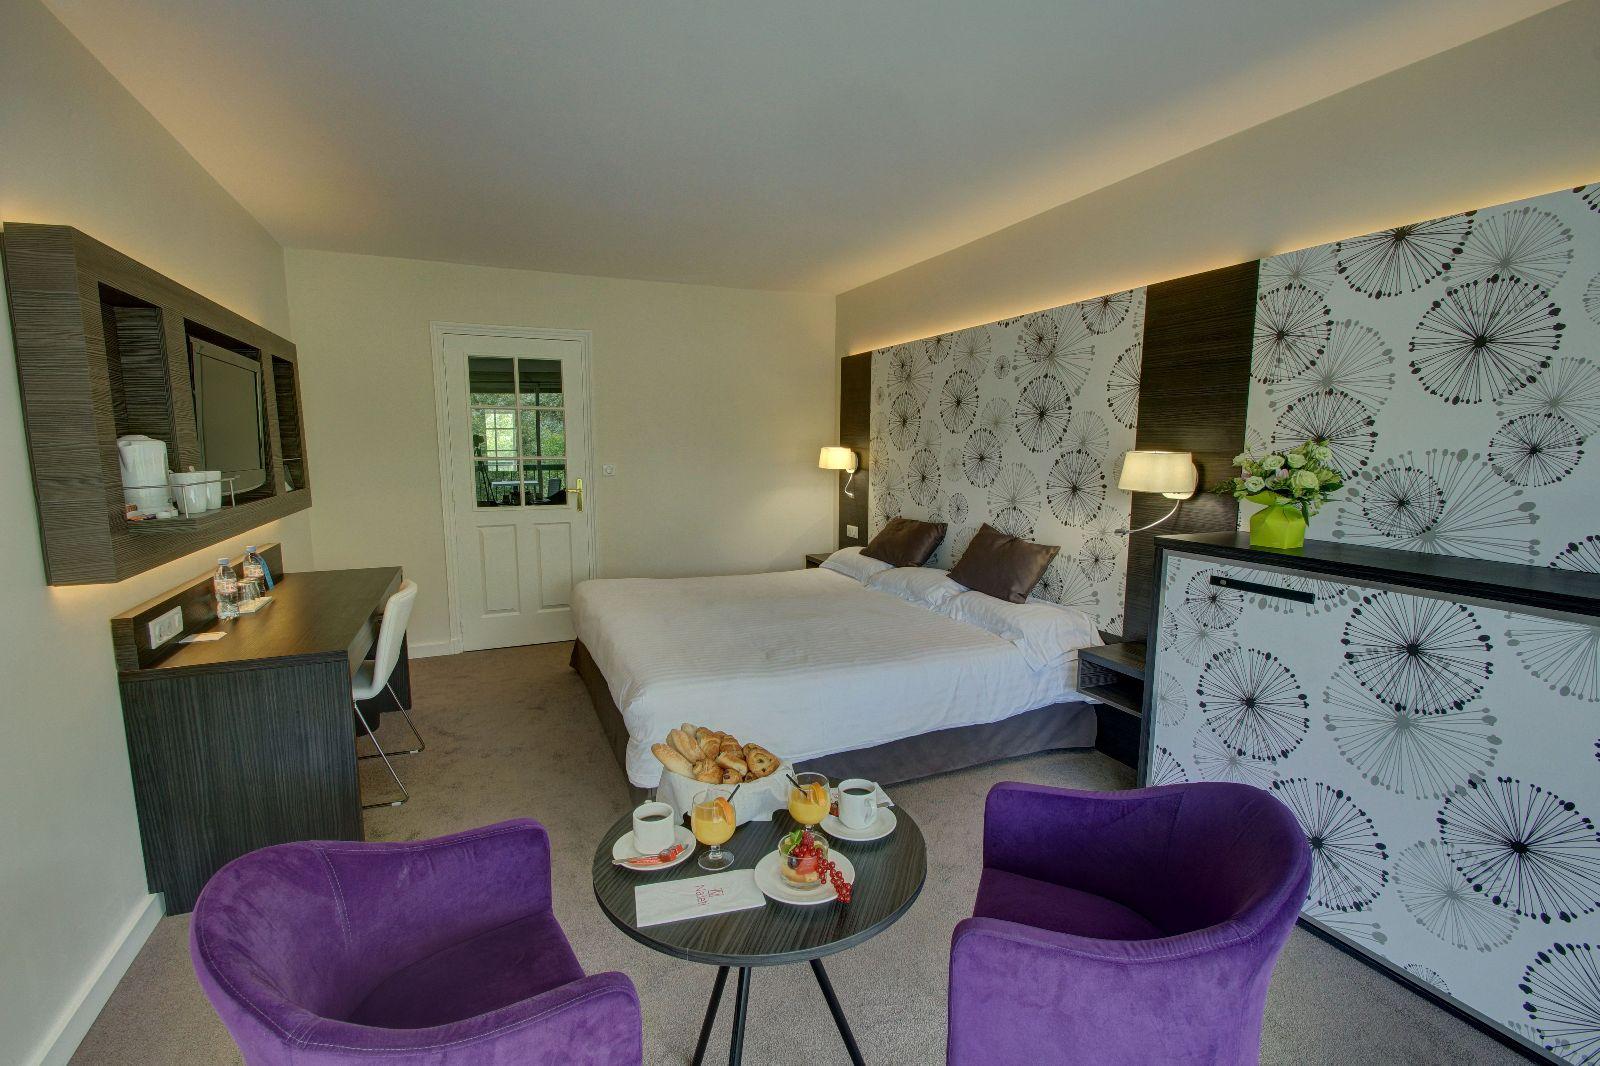 golf-expedition-golf-reizen-frankrijk-regio-pas-de-calais-hotel-du-parc-slaapkamer-stoelen-tafel-bureau.jpg